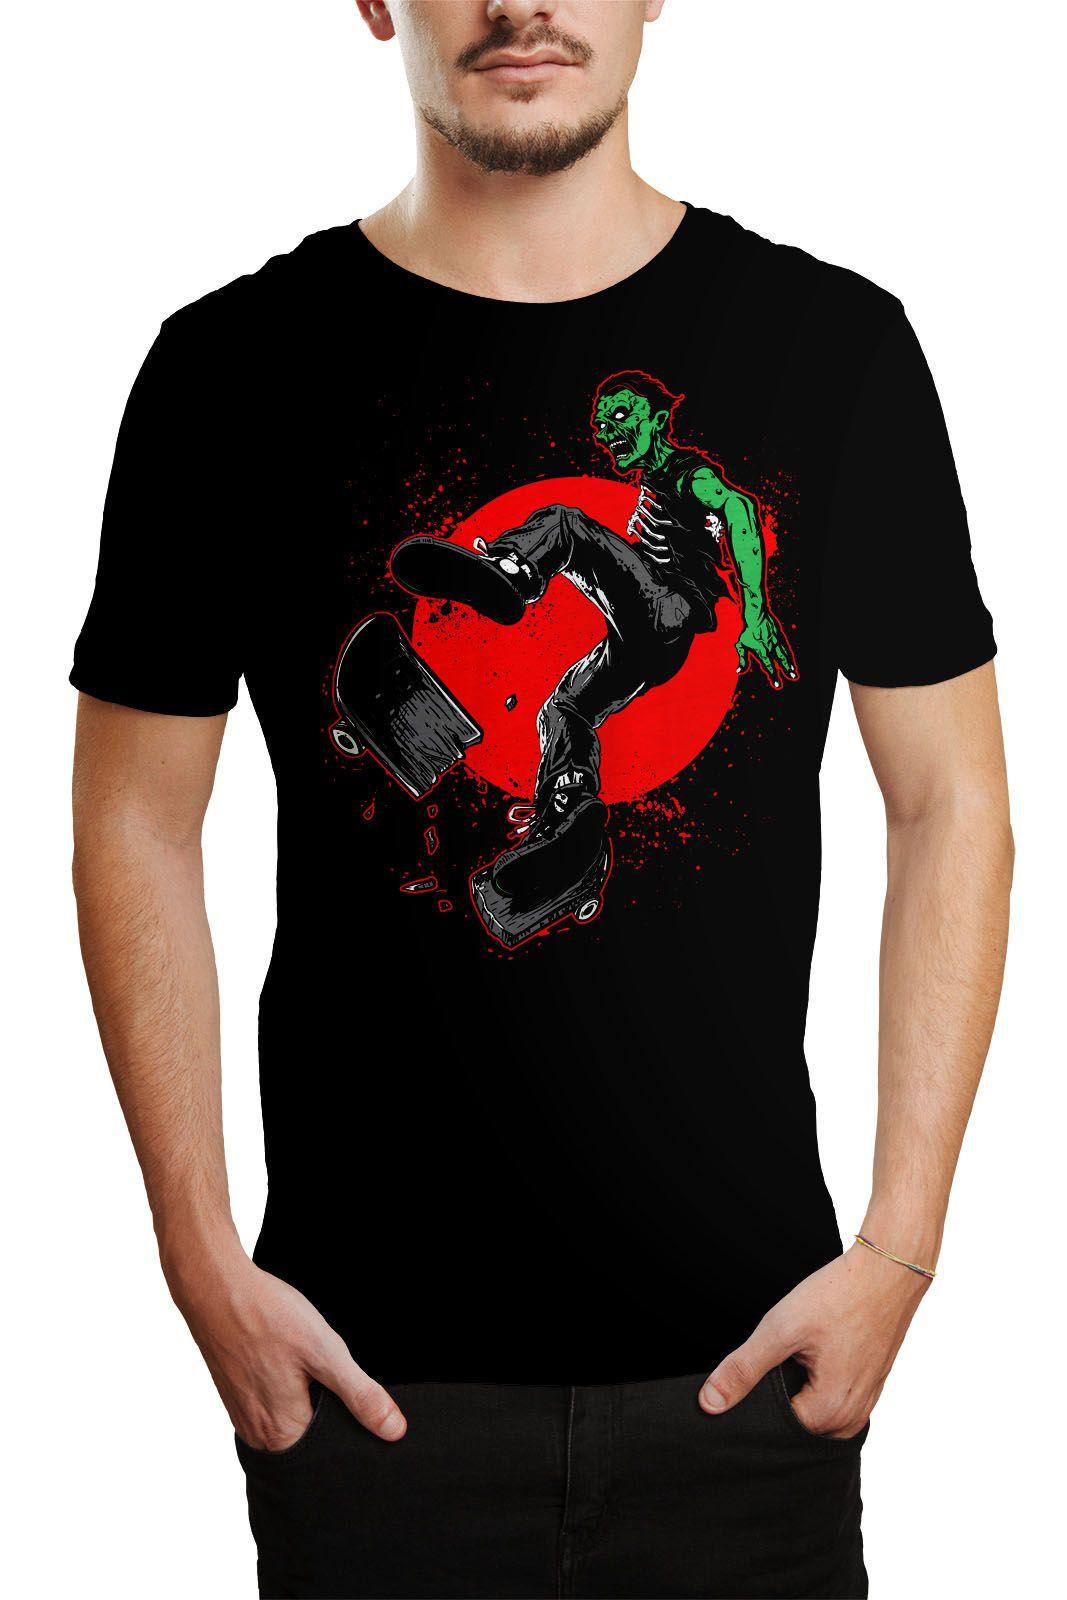 Camiseta Zumbi Skate - Tamanho GG  - HShop